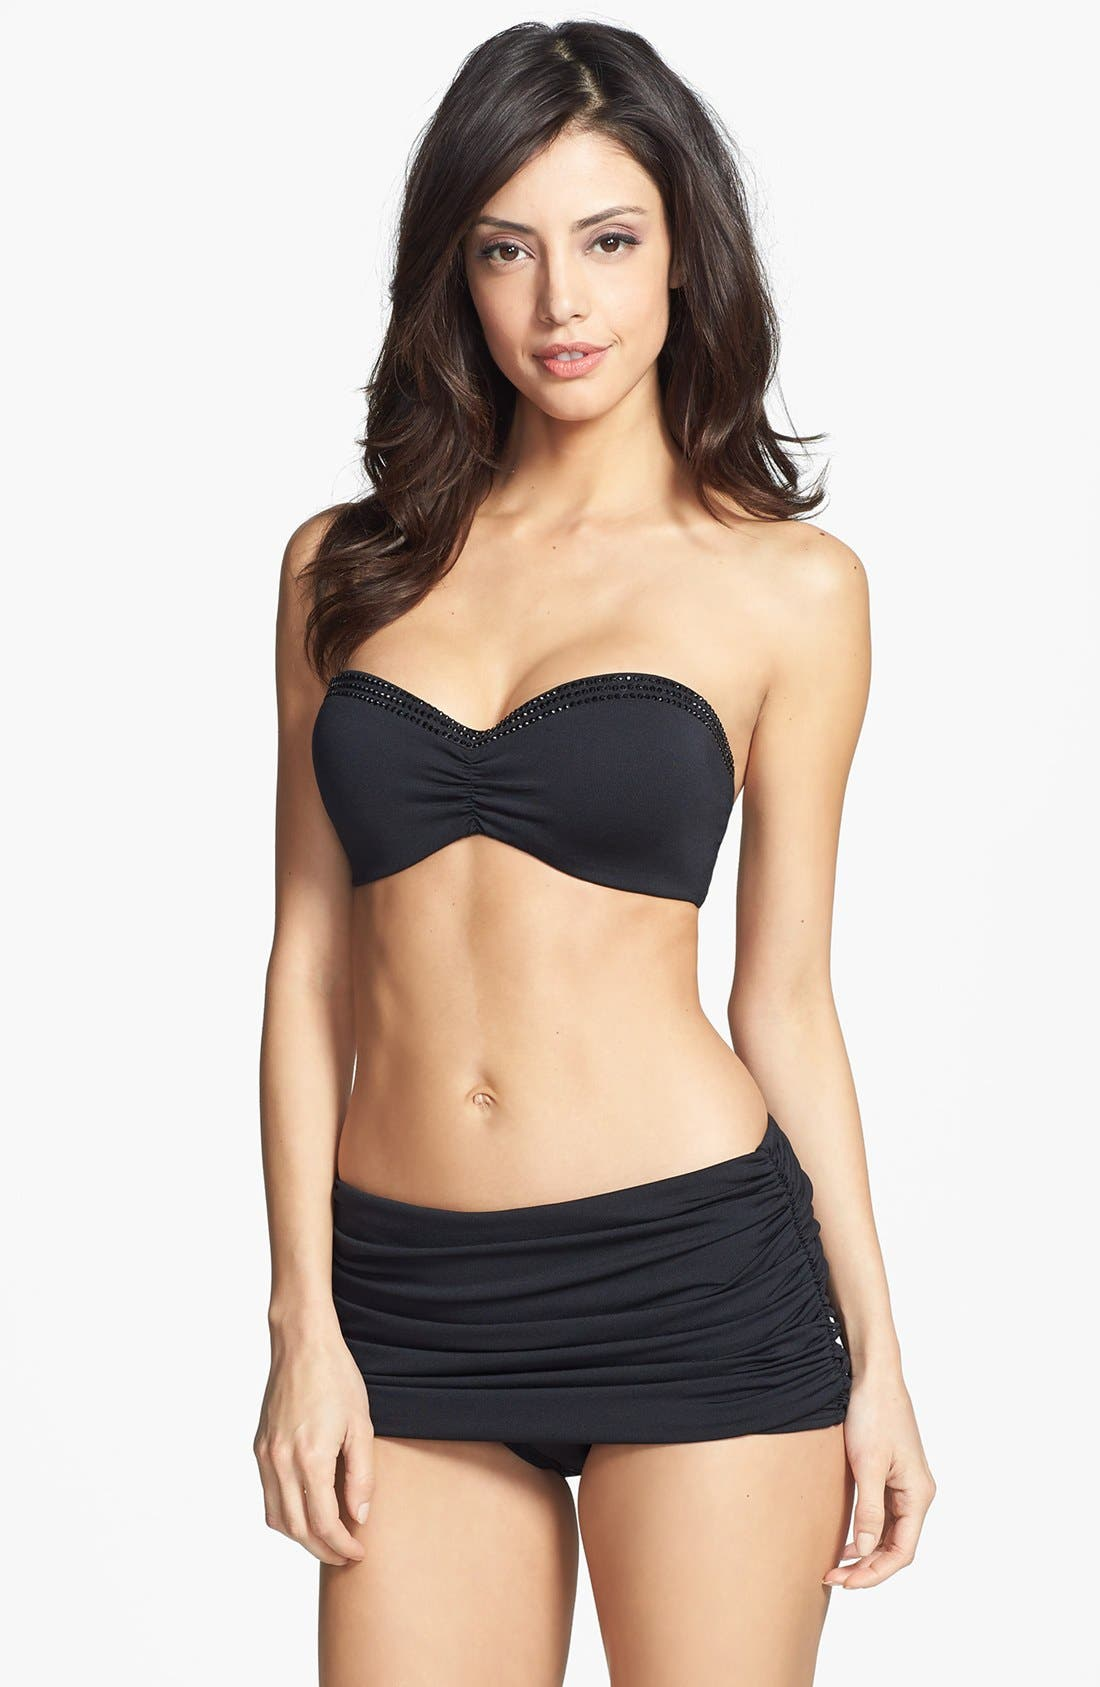 Carmen Marc Valvo 'Cape Town Beach' Shirred Skirted Bikini Bottoms,                             Alternate thumbnail 3, color,                             Luxe Black